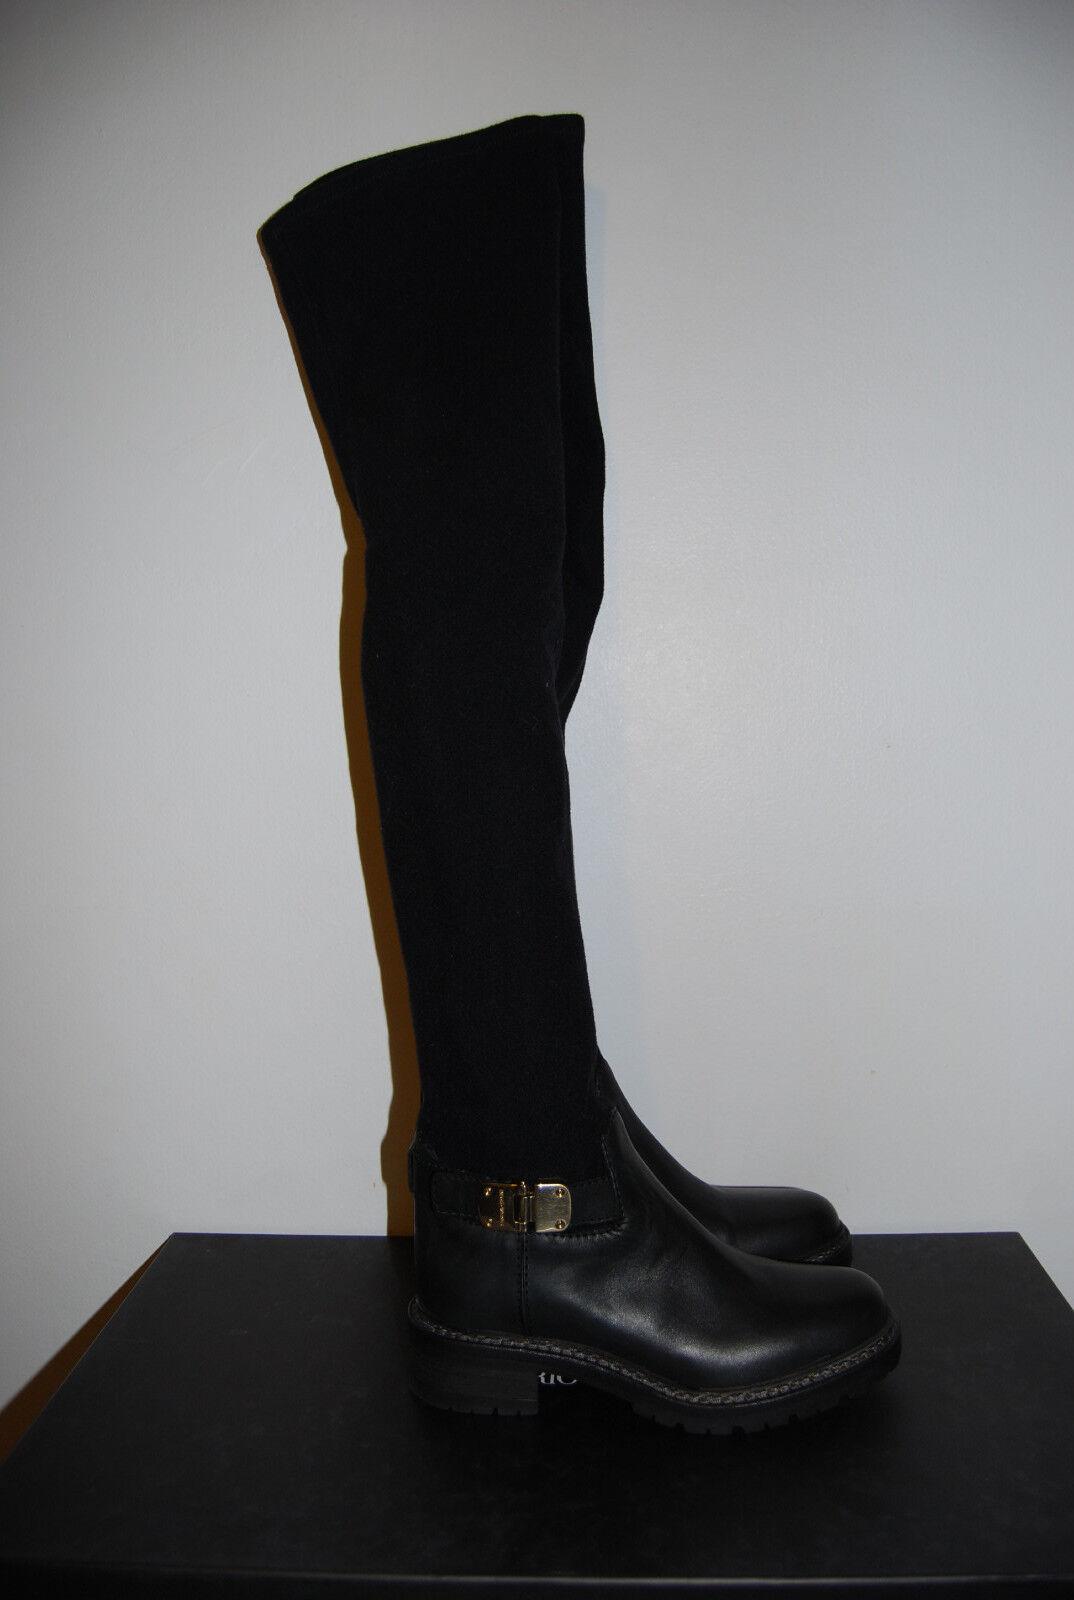 NIB Emporio Armani Black Over the Knee Buckle Boots 35  995